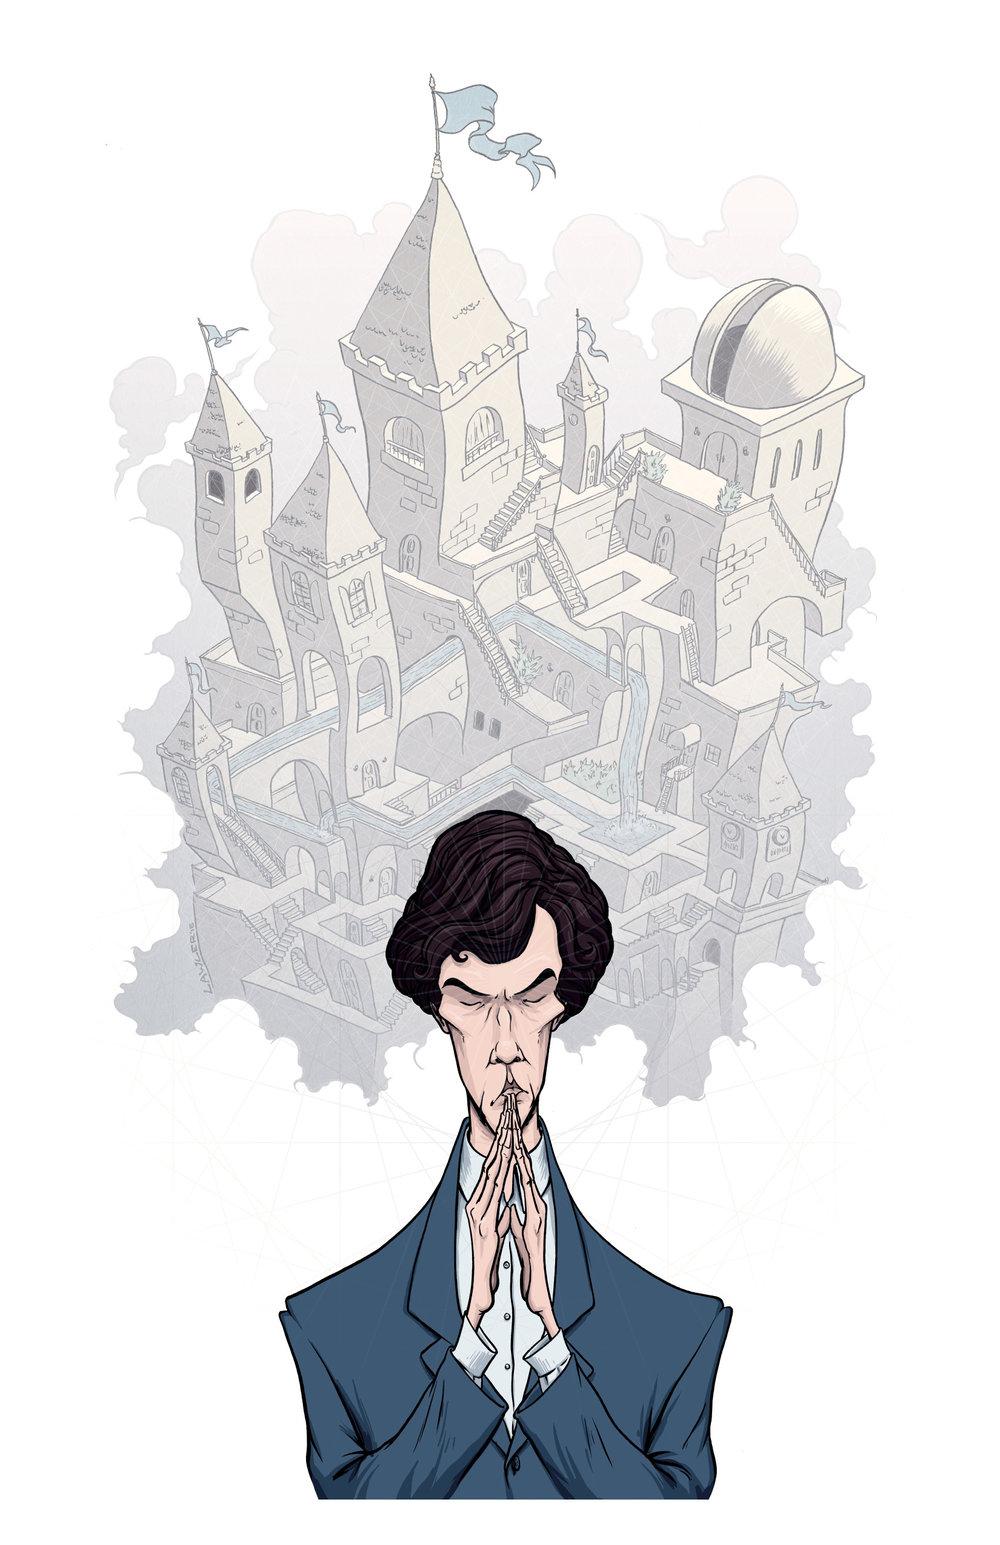 Sherlock_Mind-Palace_11x17_3.jpg